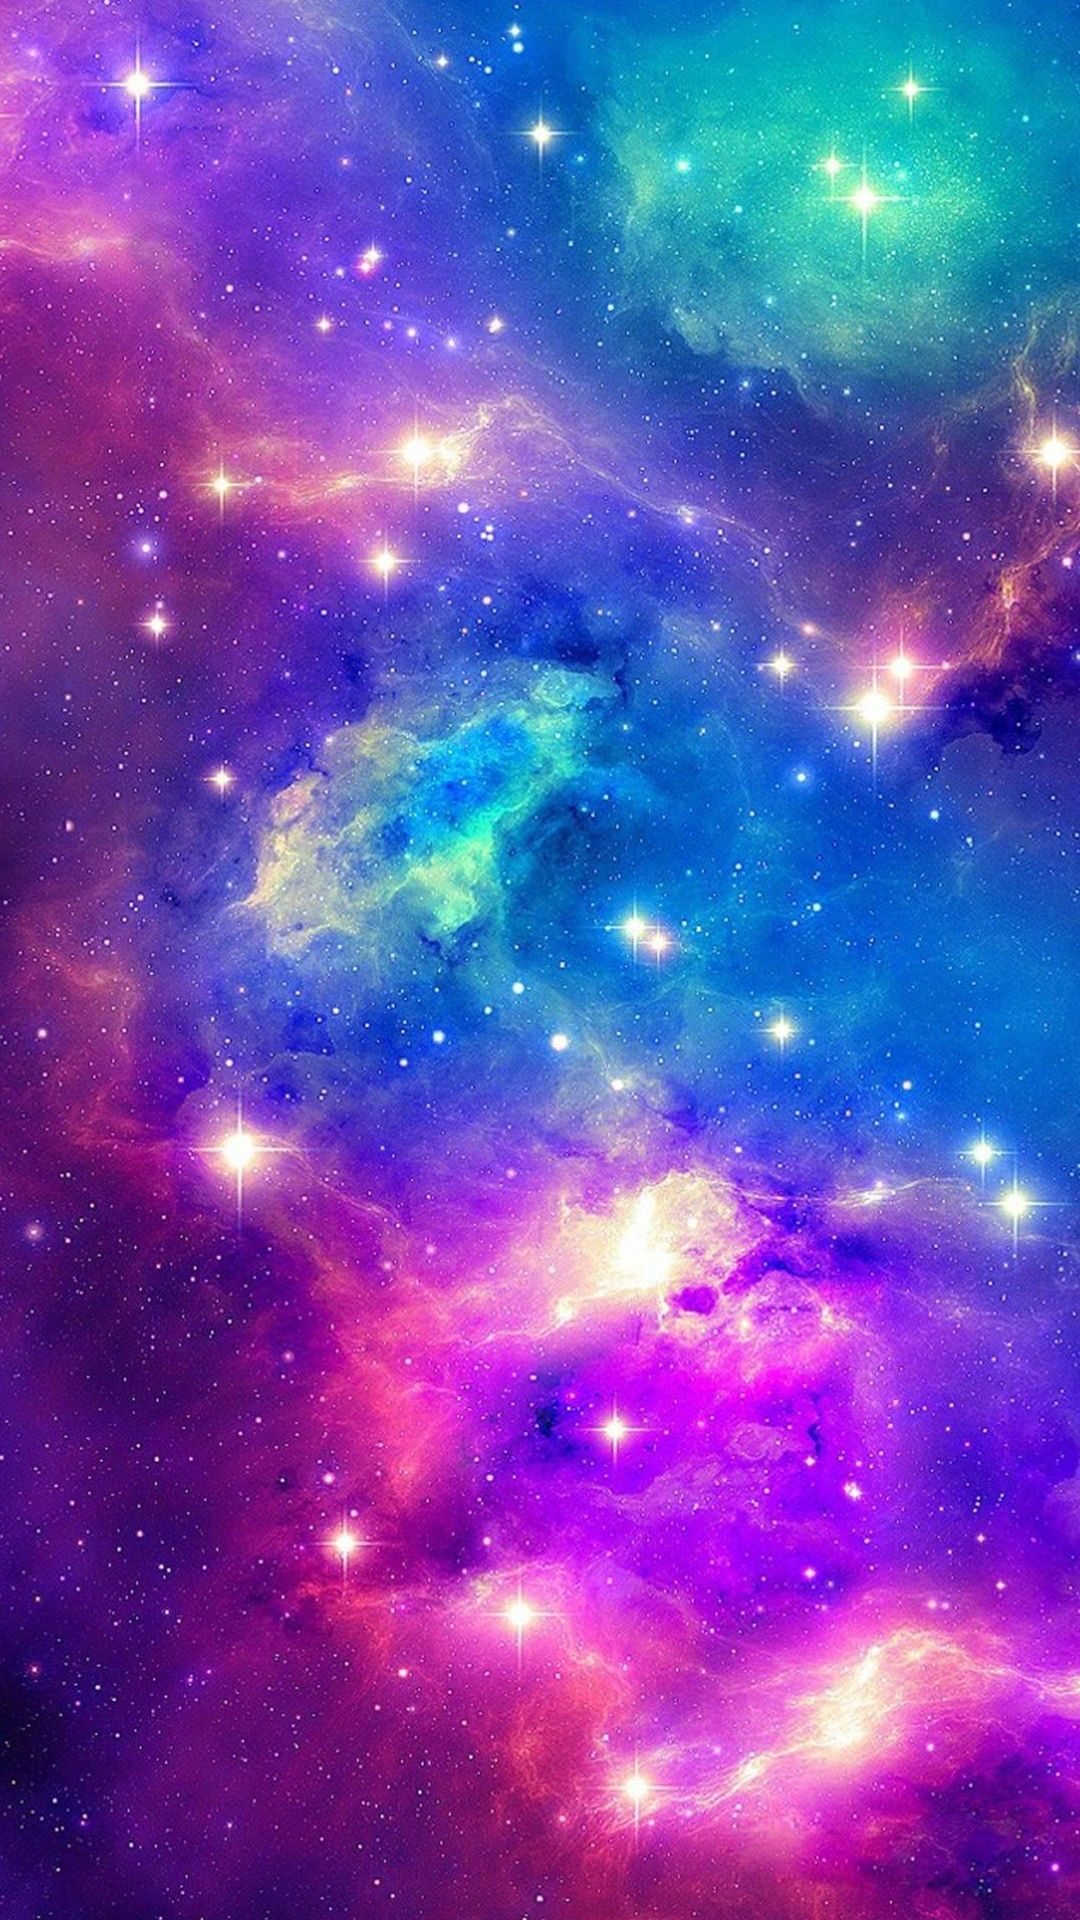 1080x1920 1080x1920 Colorful Galaxy Wallpaper Tumblr Page 2 Pics About Space Cute Galaxy Wallpaper Pastel Galaxy Galaxy Wallpaper